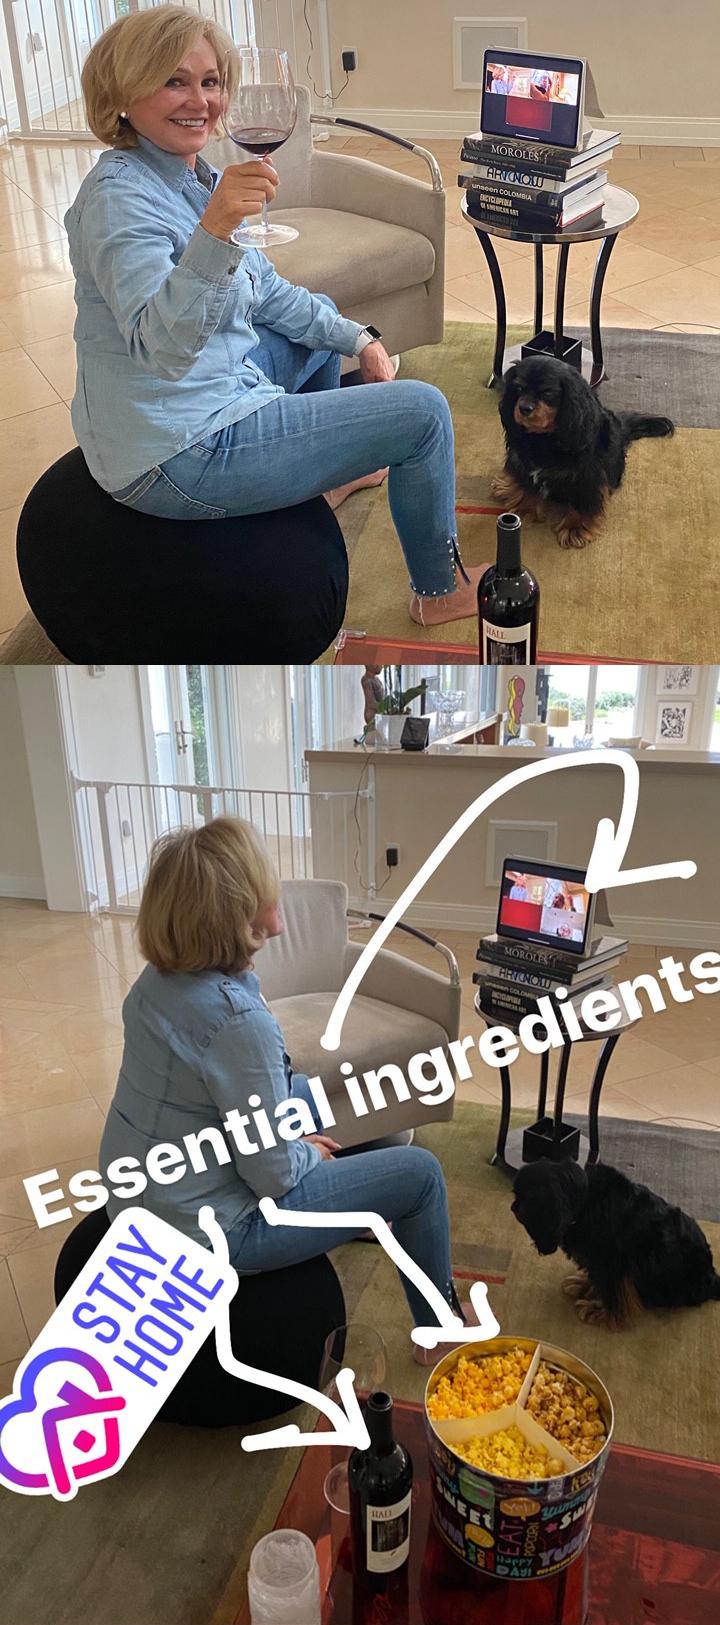 Kathryn's Stay Home Essential Ingredients